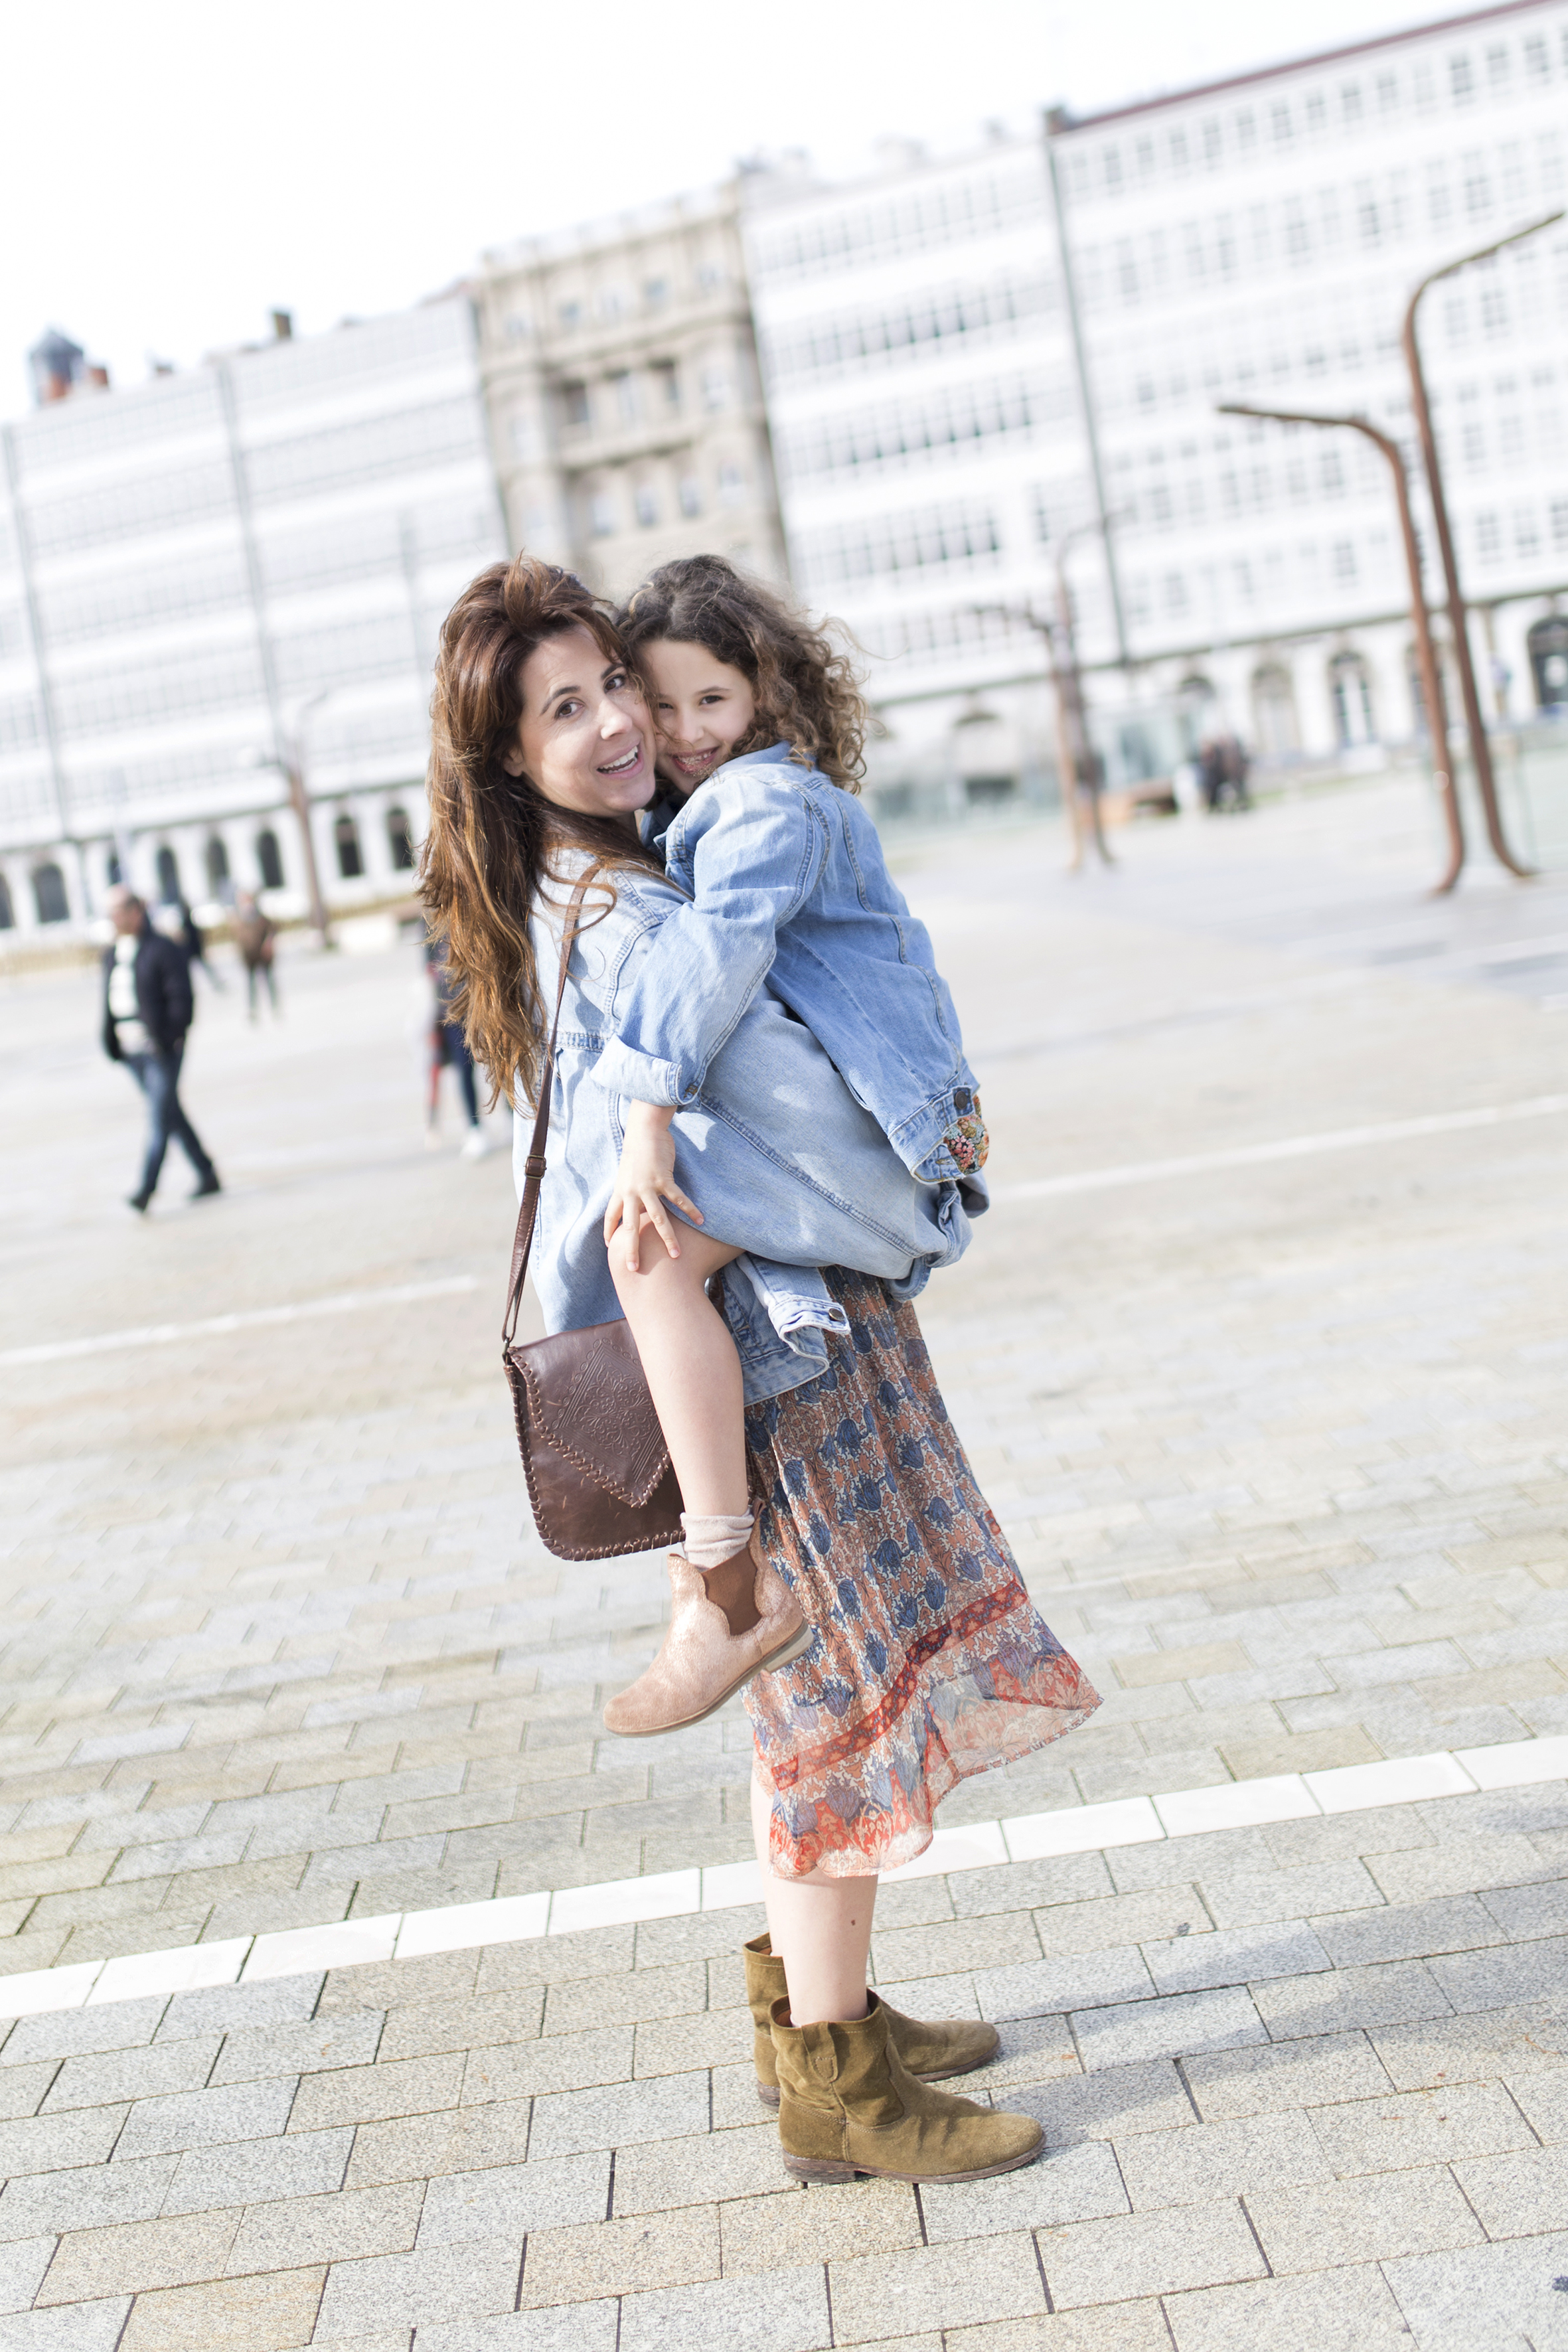 My partner-madre e hija- fashion-moda-street style-jimena&me-mother daughter-promod-zara kids-denim jacket